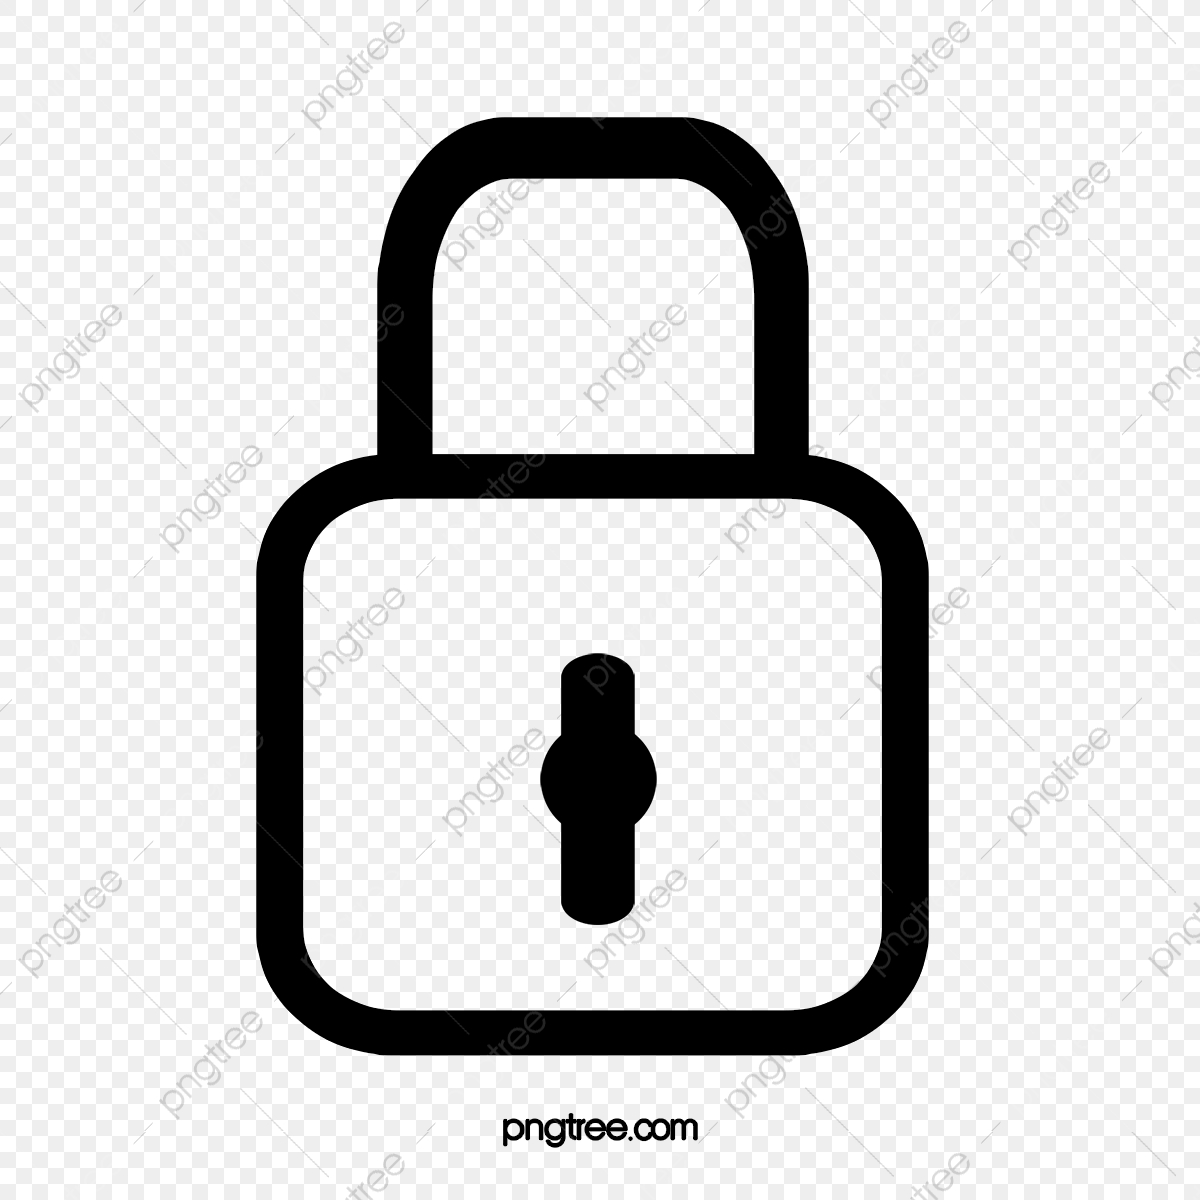 Lock, Lock Clipart, Lock Material PNG Transparent Clipart.